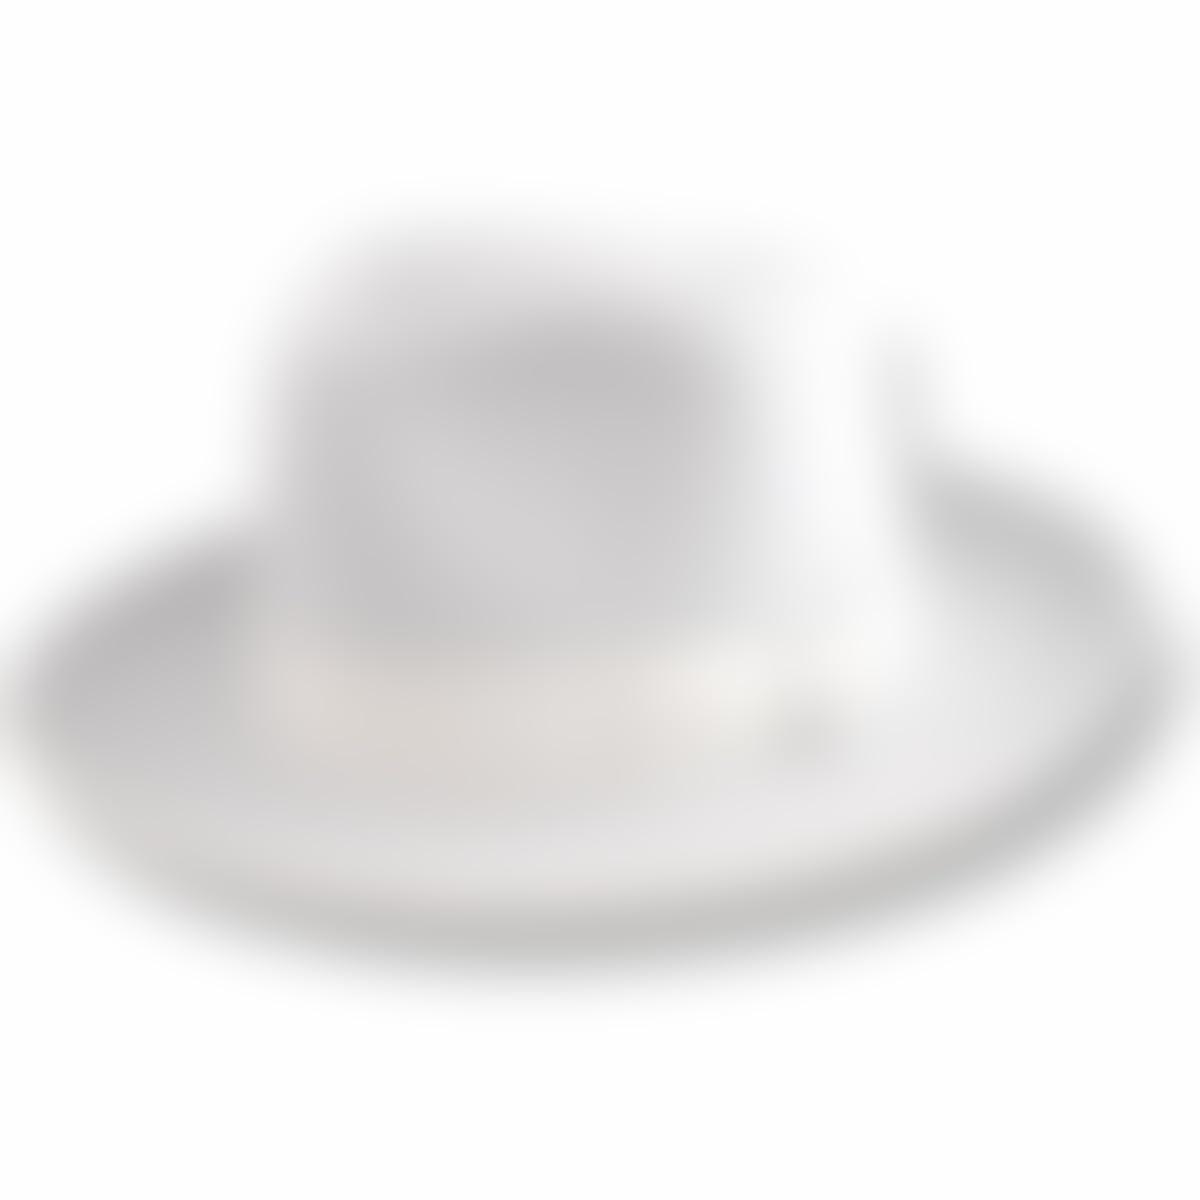 d60b0987929b59 Amazon.com: Fedora Johnny top quality raplica hat Light Grey: Handmade